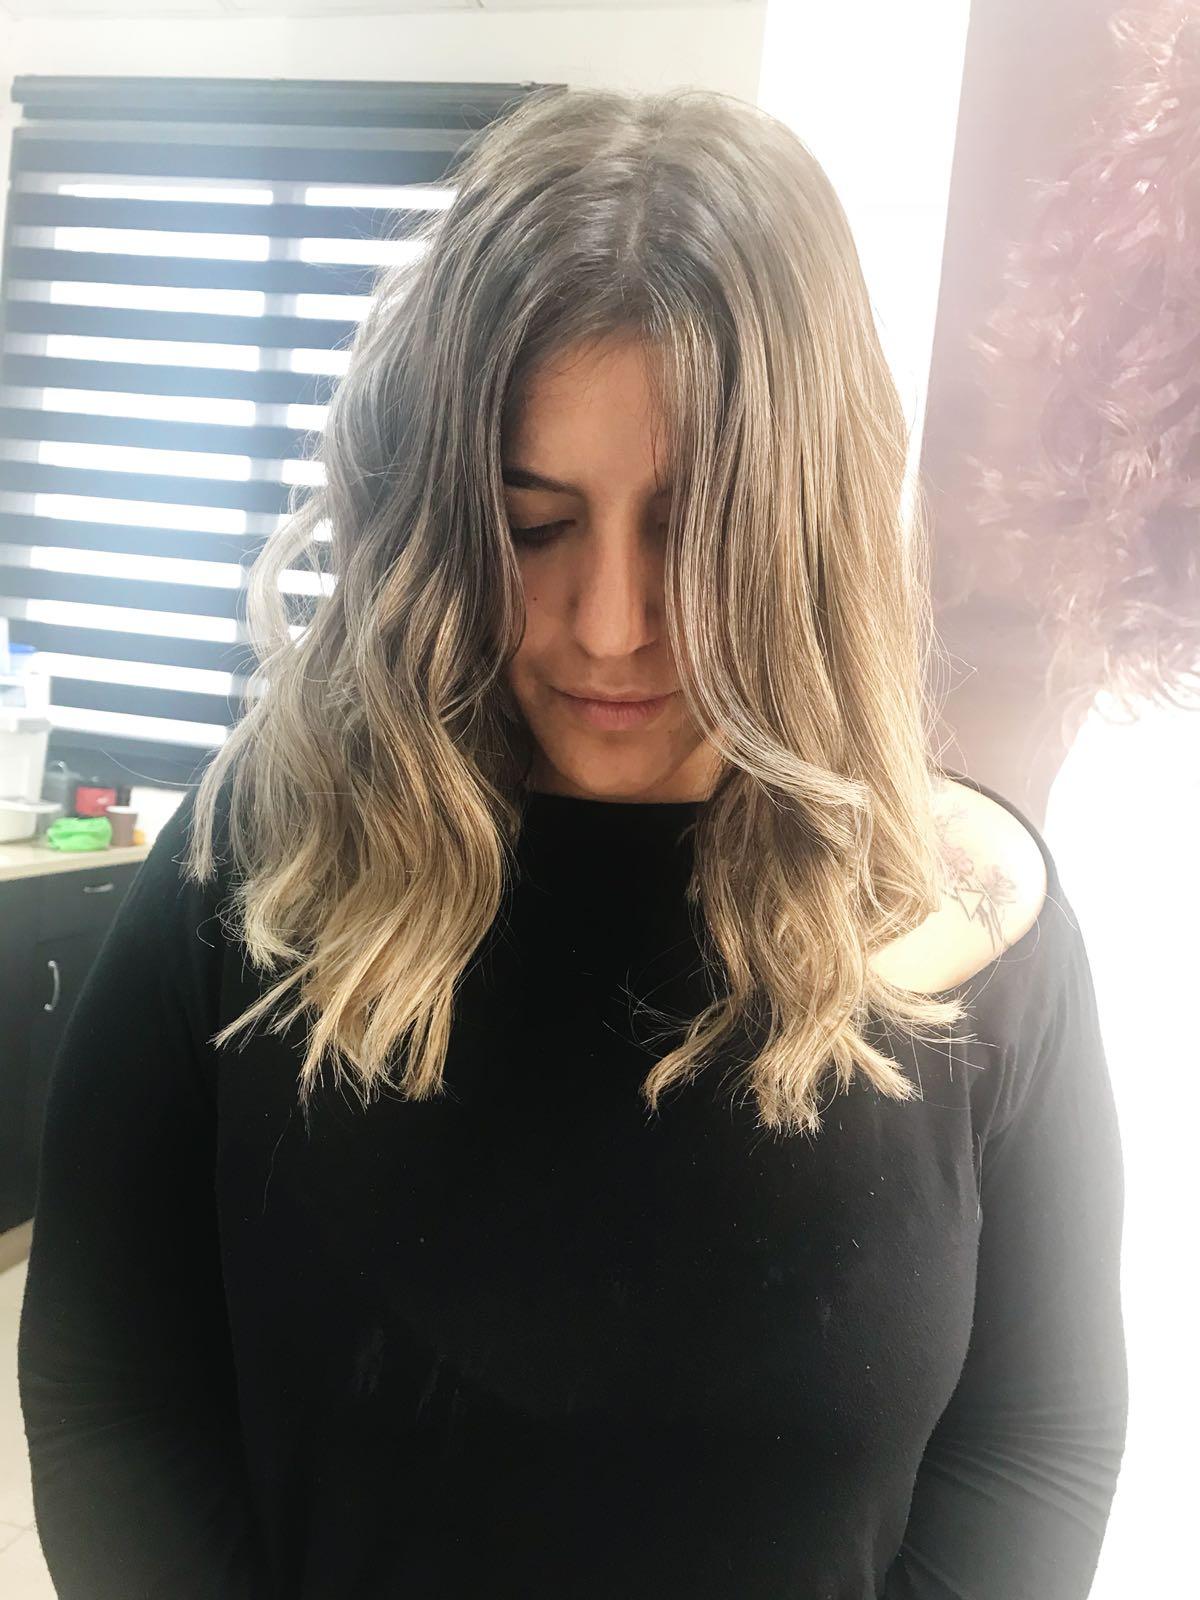 צבעי שיער בקצרין שימי מנטל